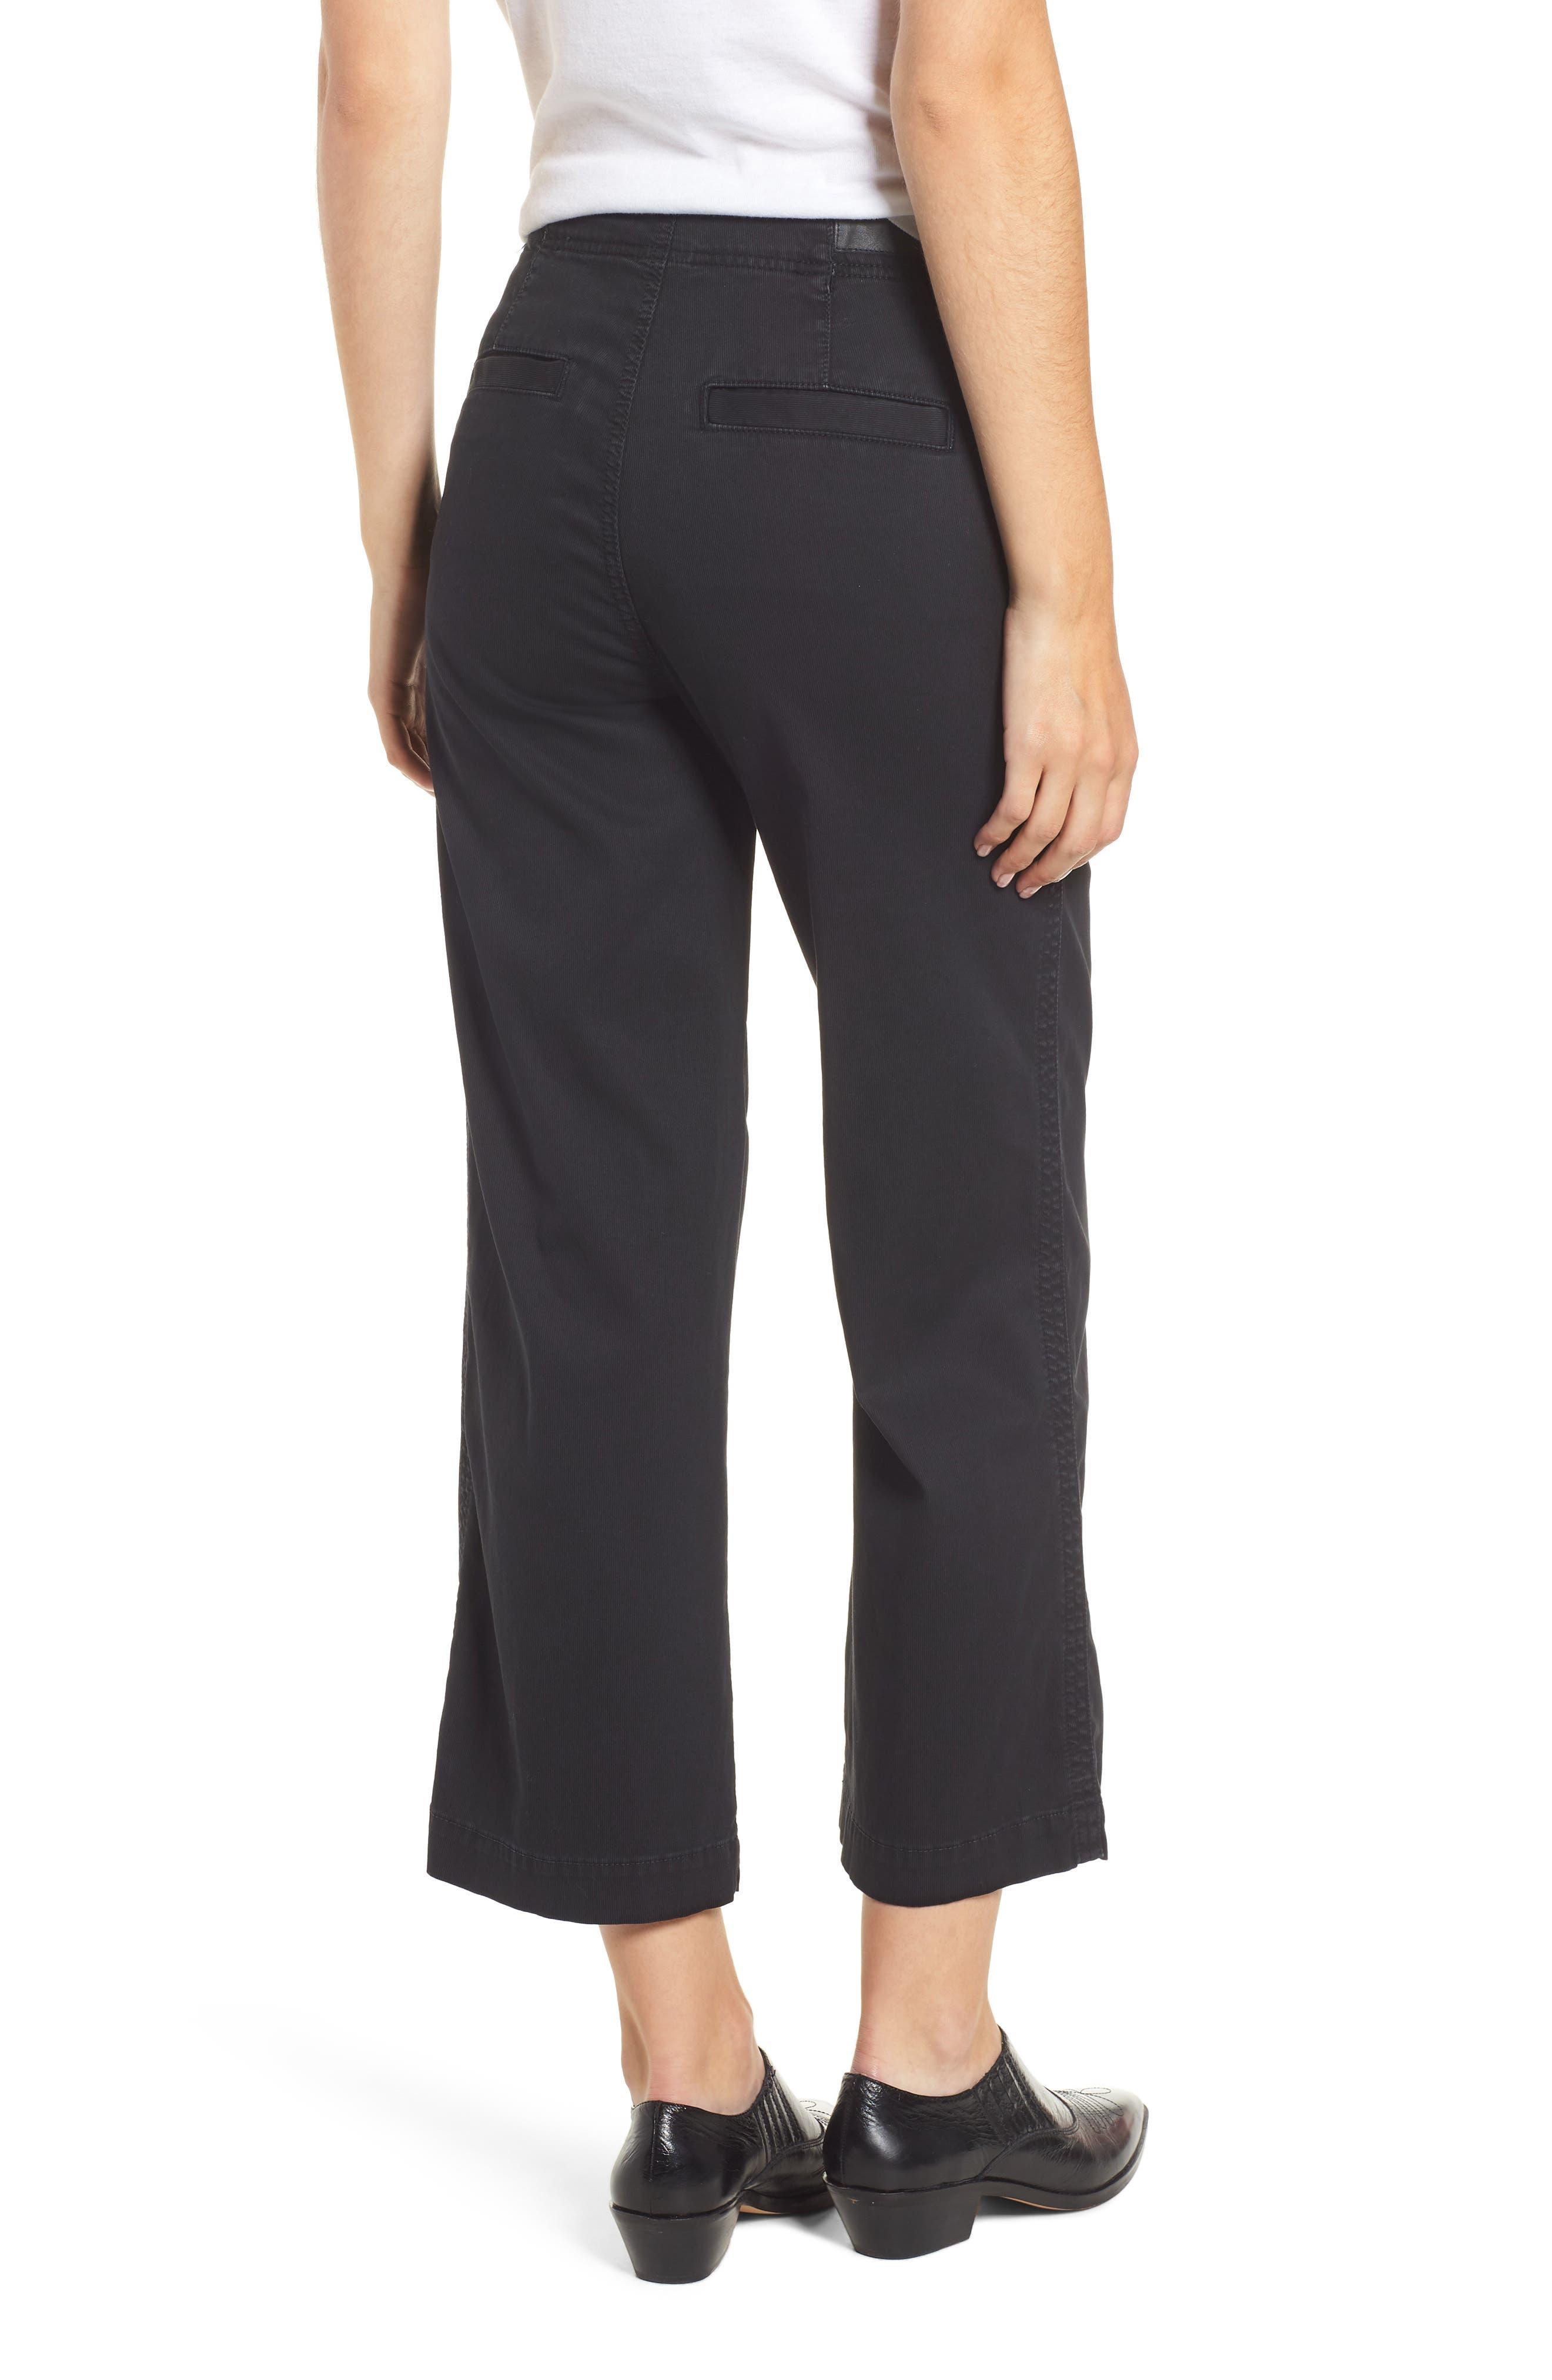 Etta High Waist Crop Wide Leg Jeans,                             Alternate thumbnail 2, color,                             SULFUR SUPER BLACK